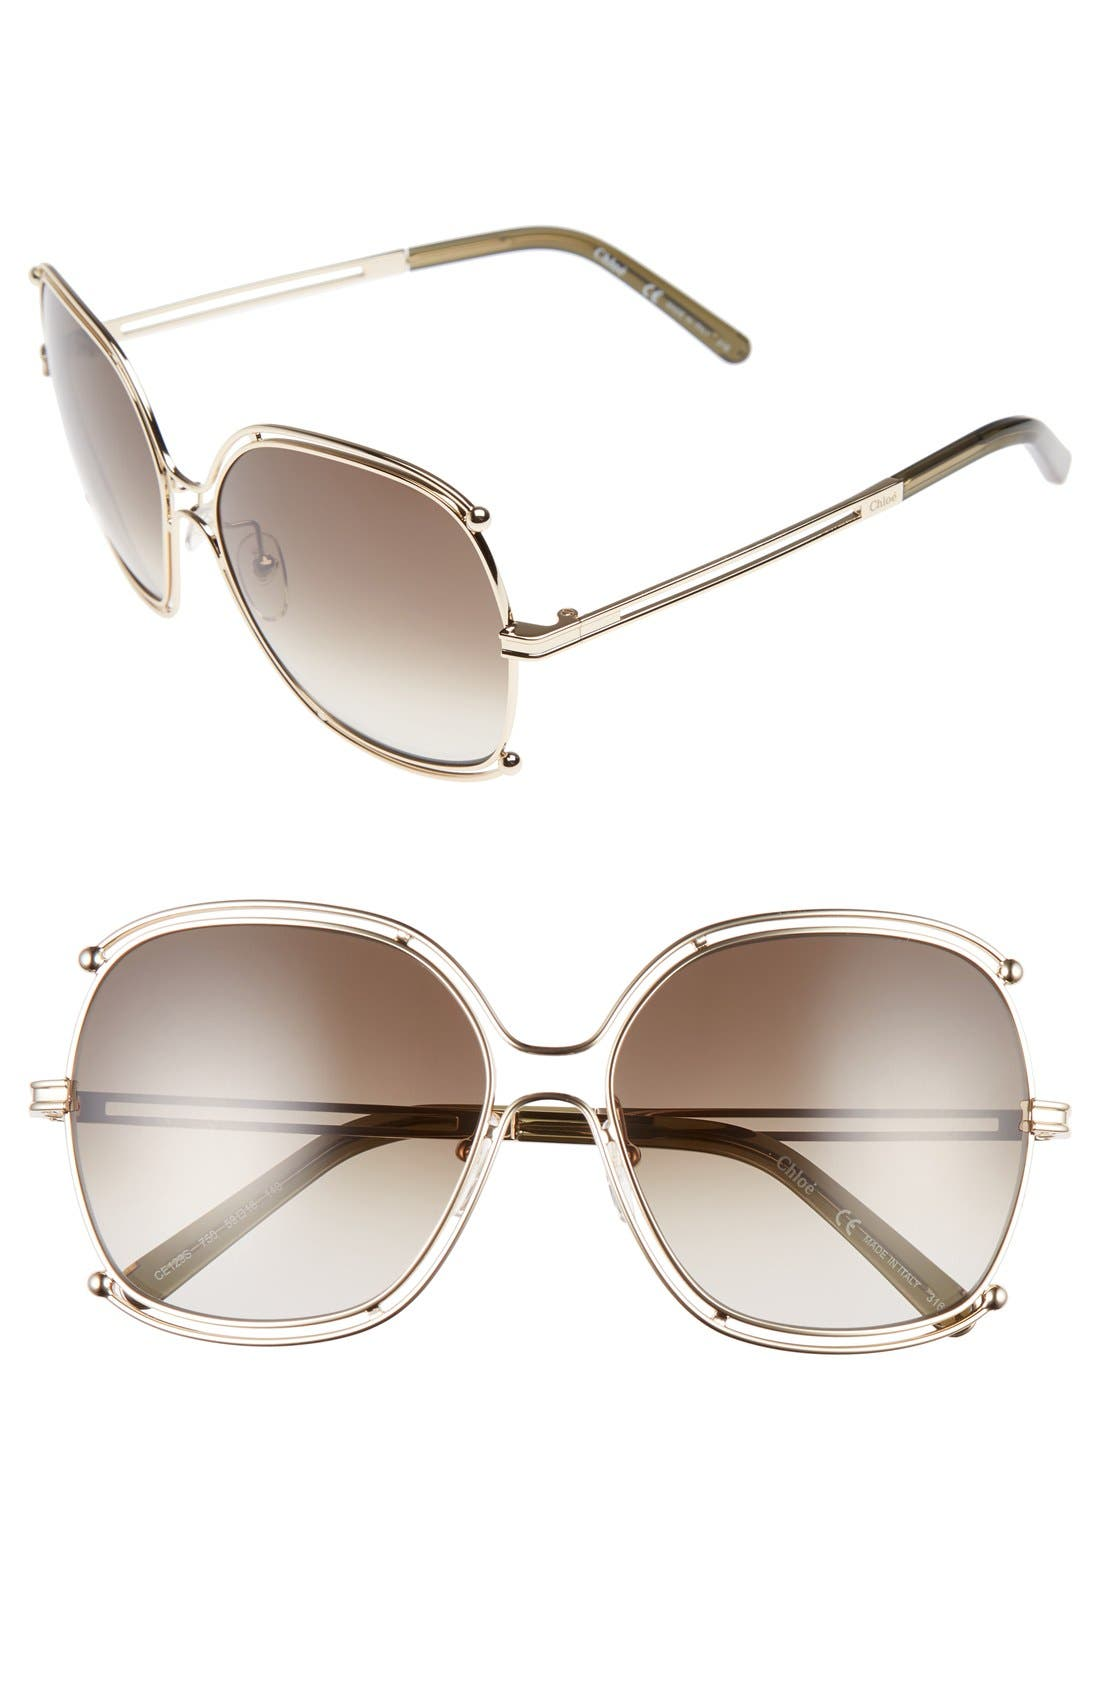 Main Image - Chloé Isidora 59mm Square Sunglasses